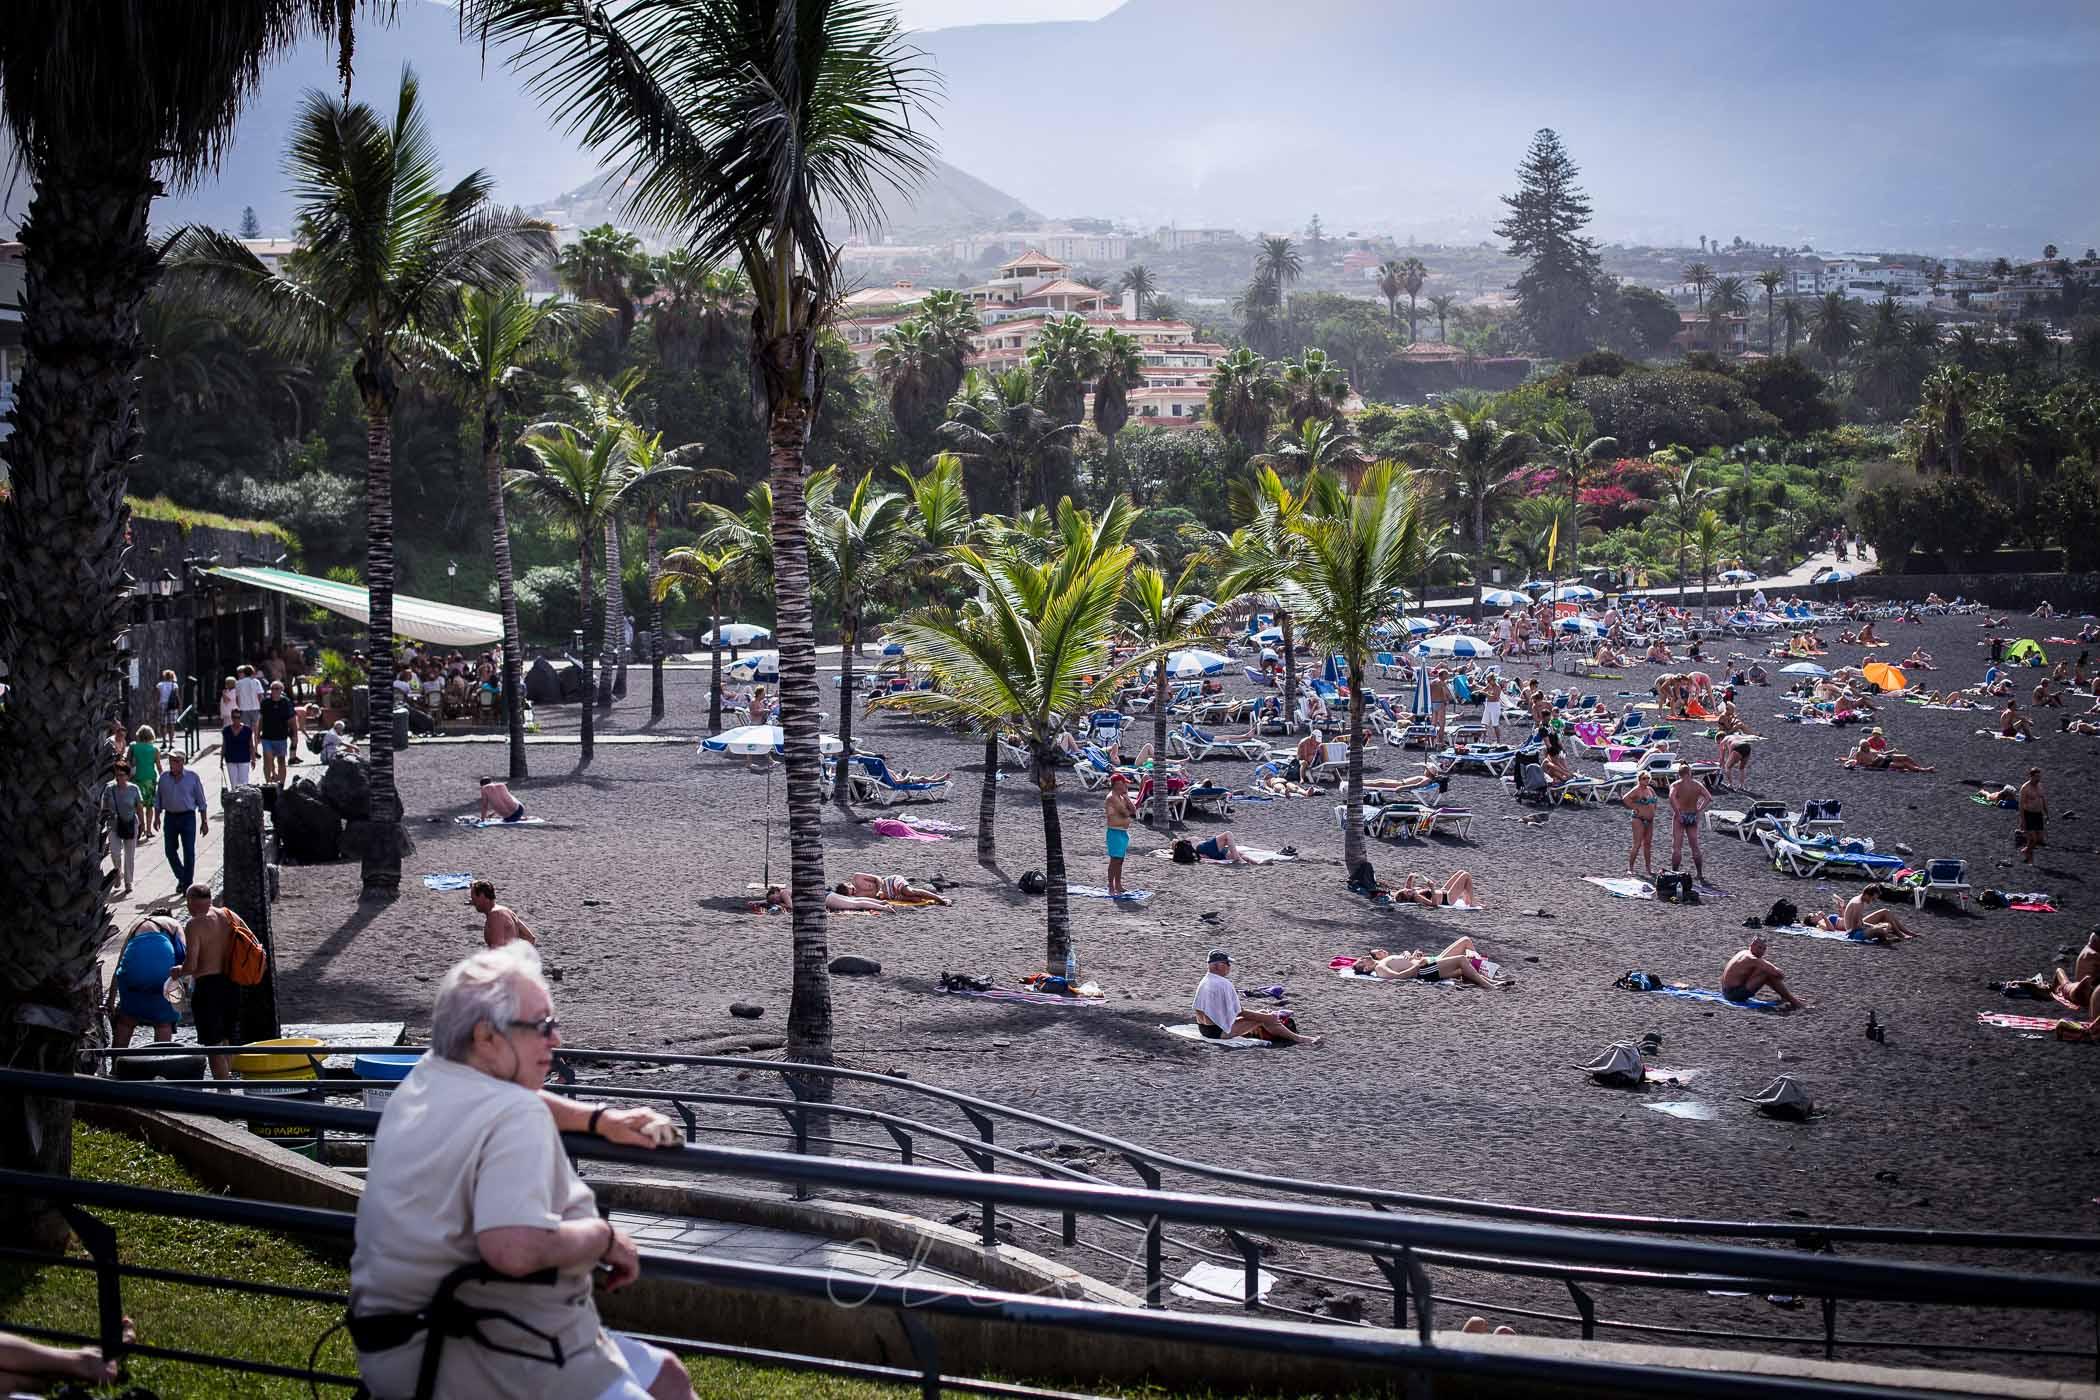 Playa La Arena, Puerto de la cruz, plaża na Teneryfie, plaże na teneryfie, najpiękniejsze plaże na Teneryfie